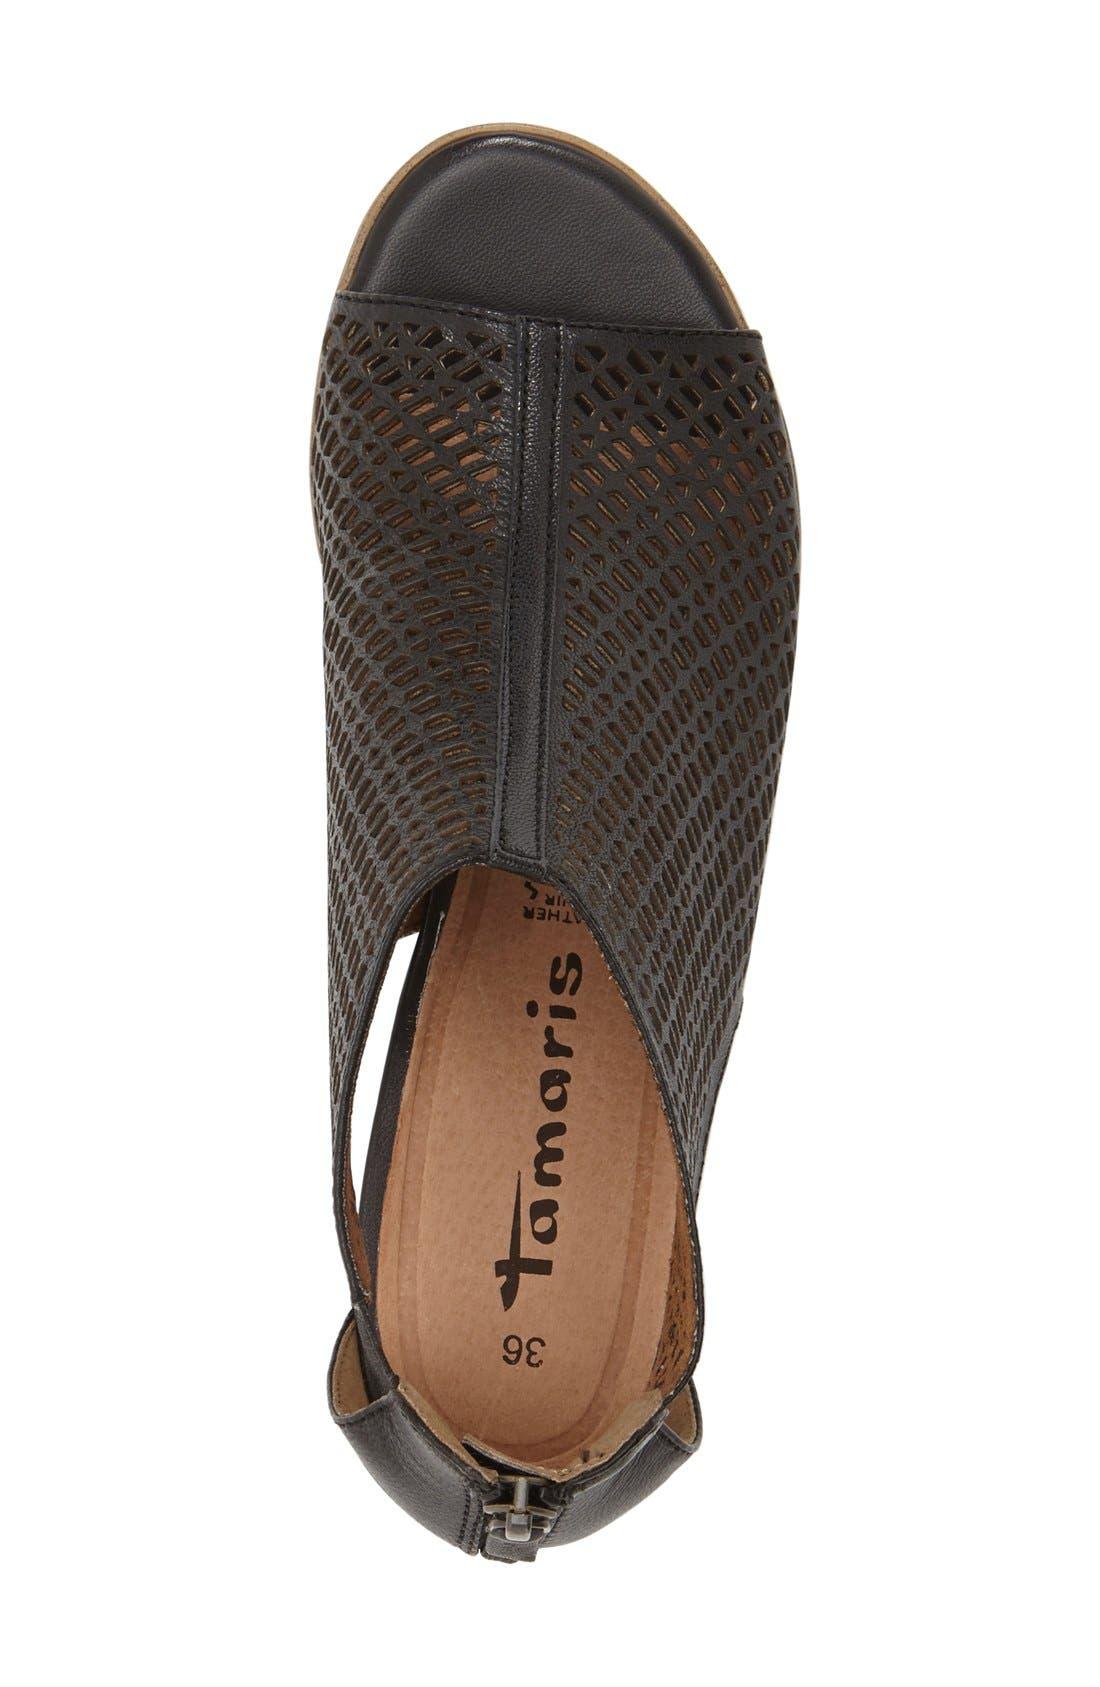 'Nao' Open Toe Sandal,                             Alternate thumbnail 3, color,                             Black Leather